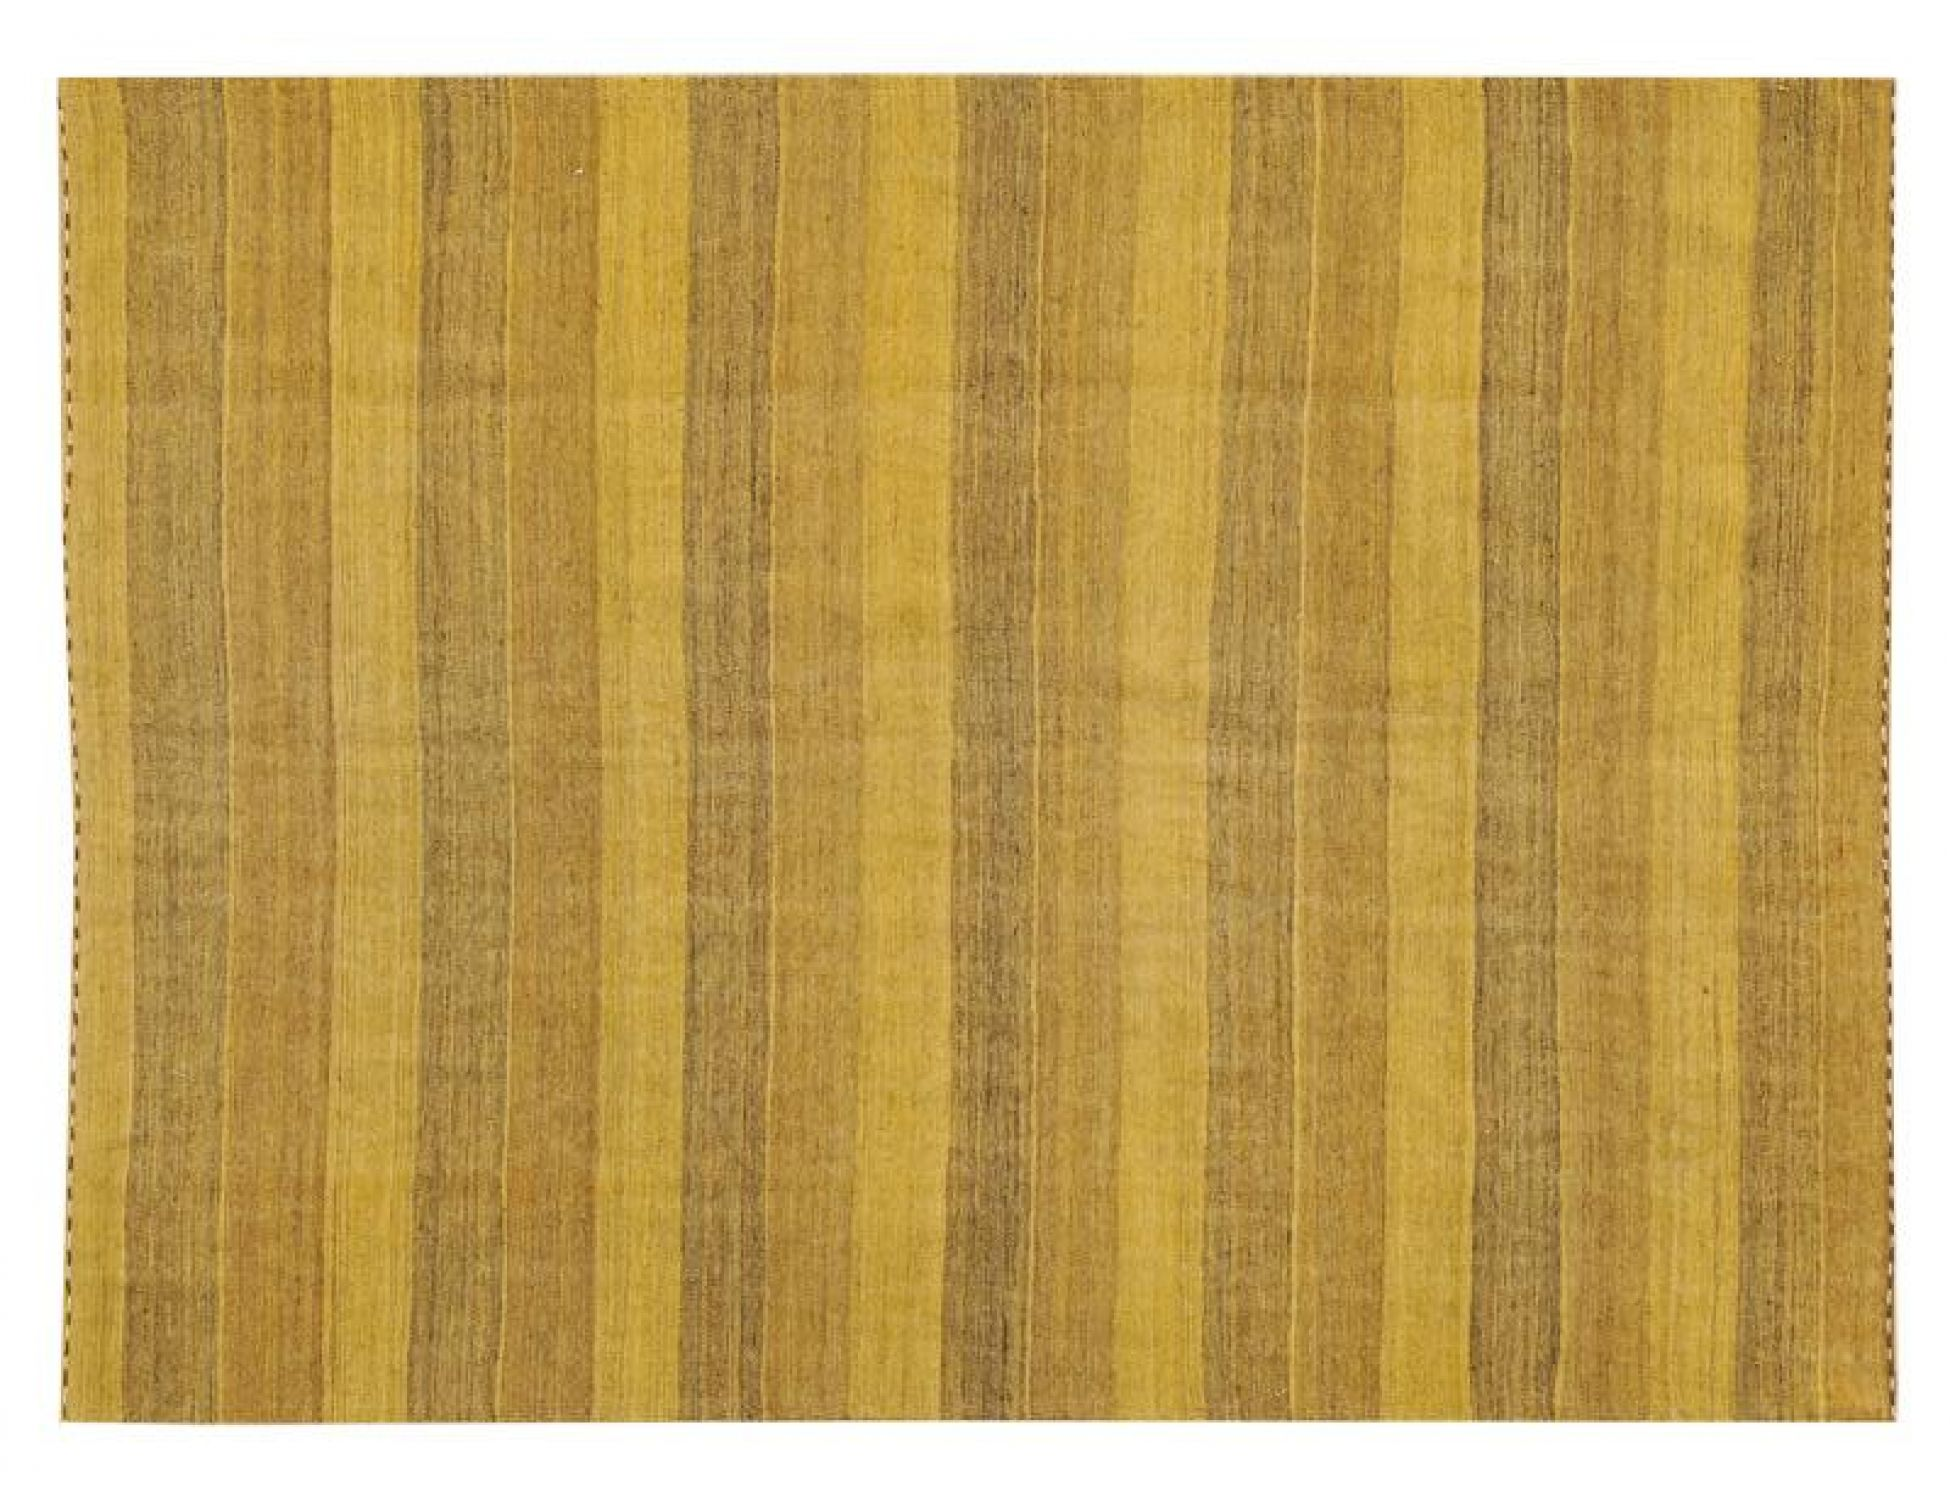 PERSIAN WOOL KILIMS   <br/>235 x 180 cm